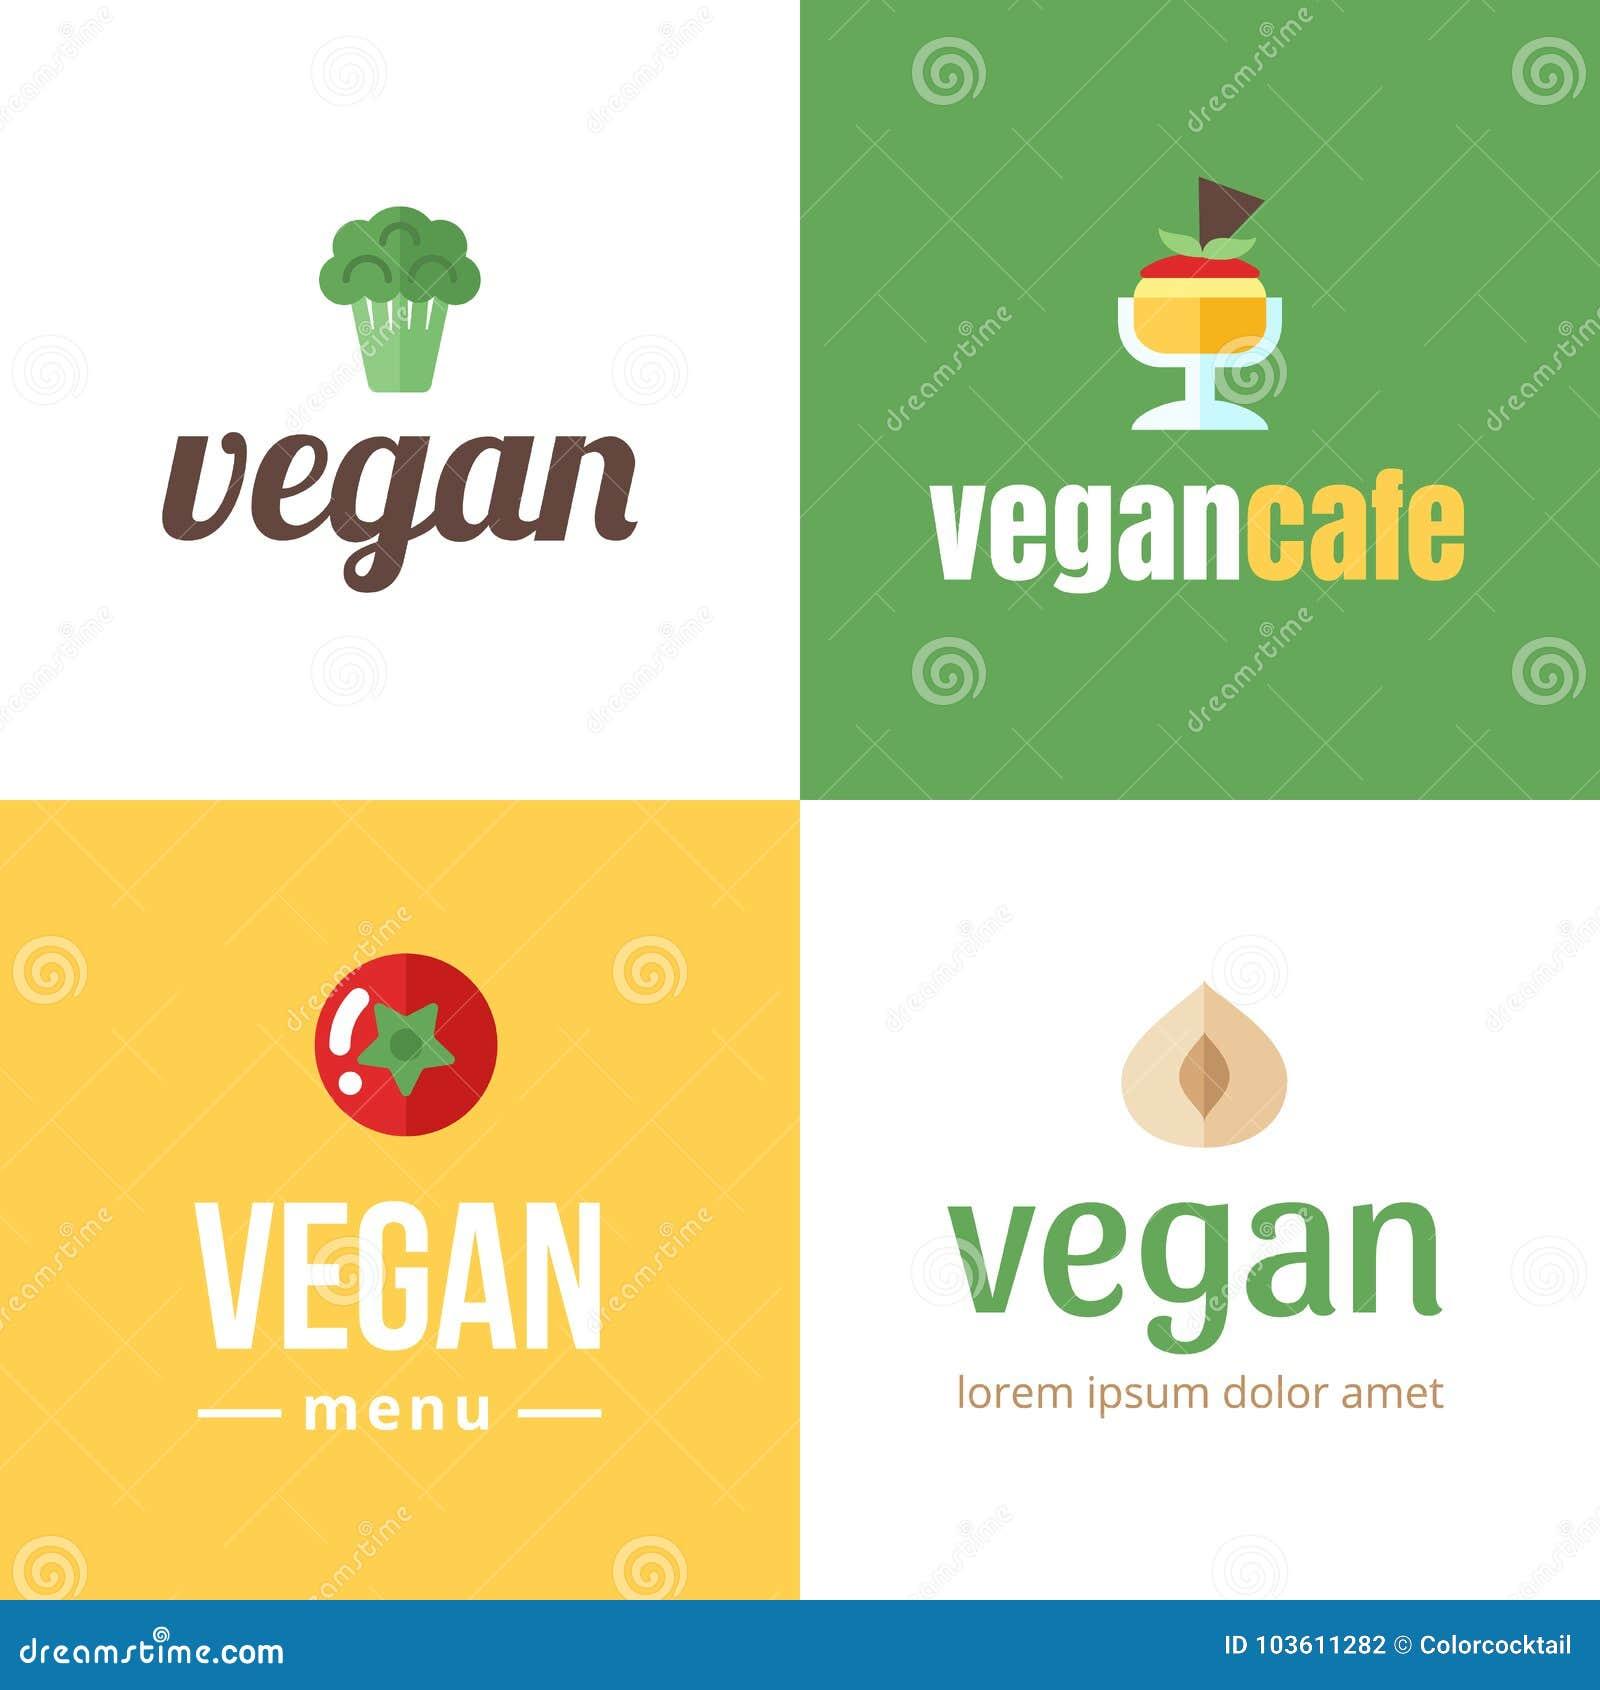 Vegan Logo Template  Flat Style  Stock Vector - Illustration of